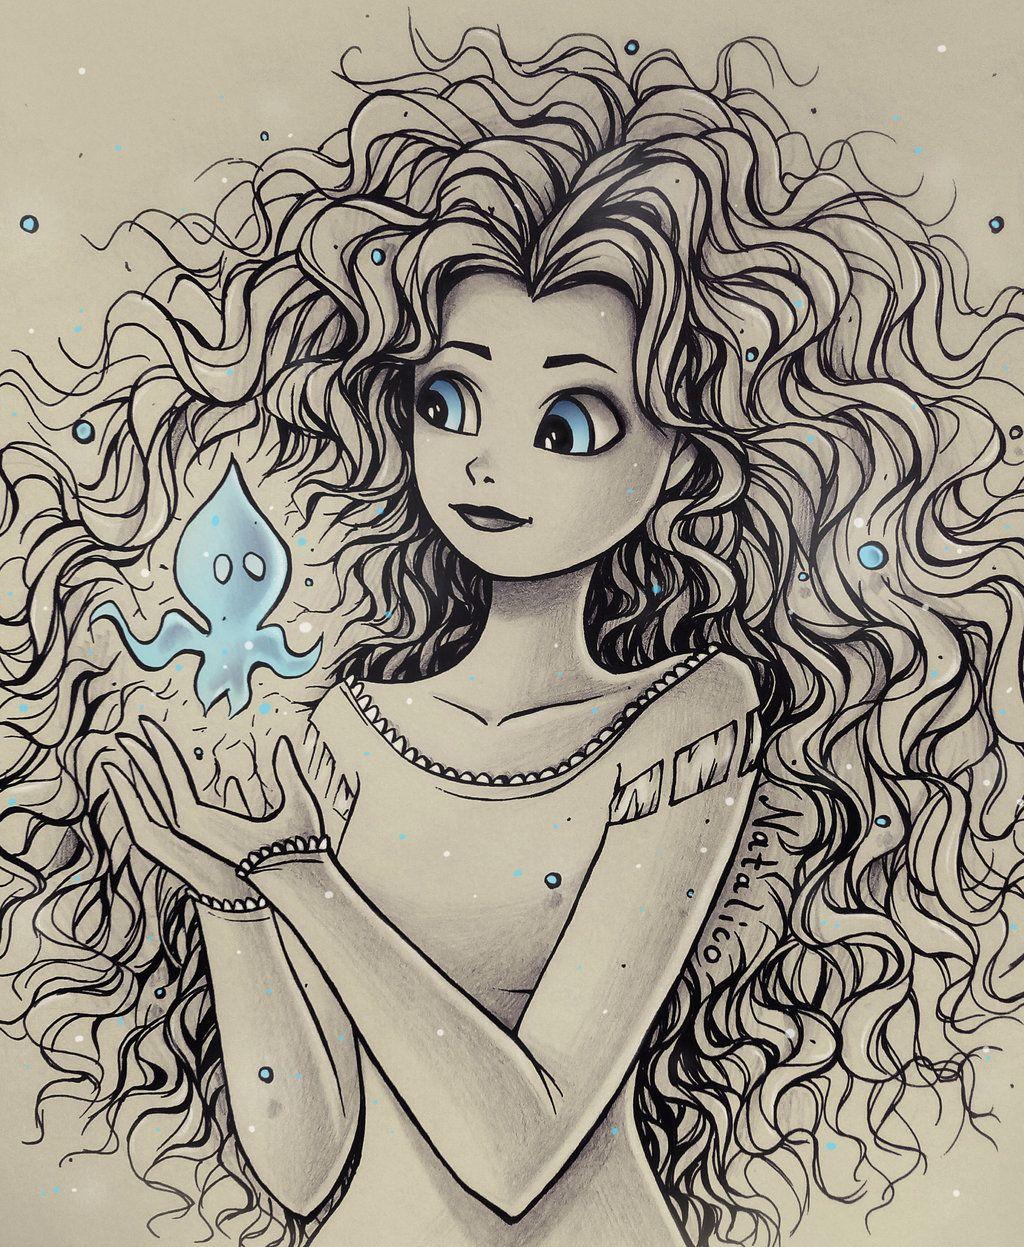 '-wisp Natalico Cool Art Disney